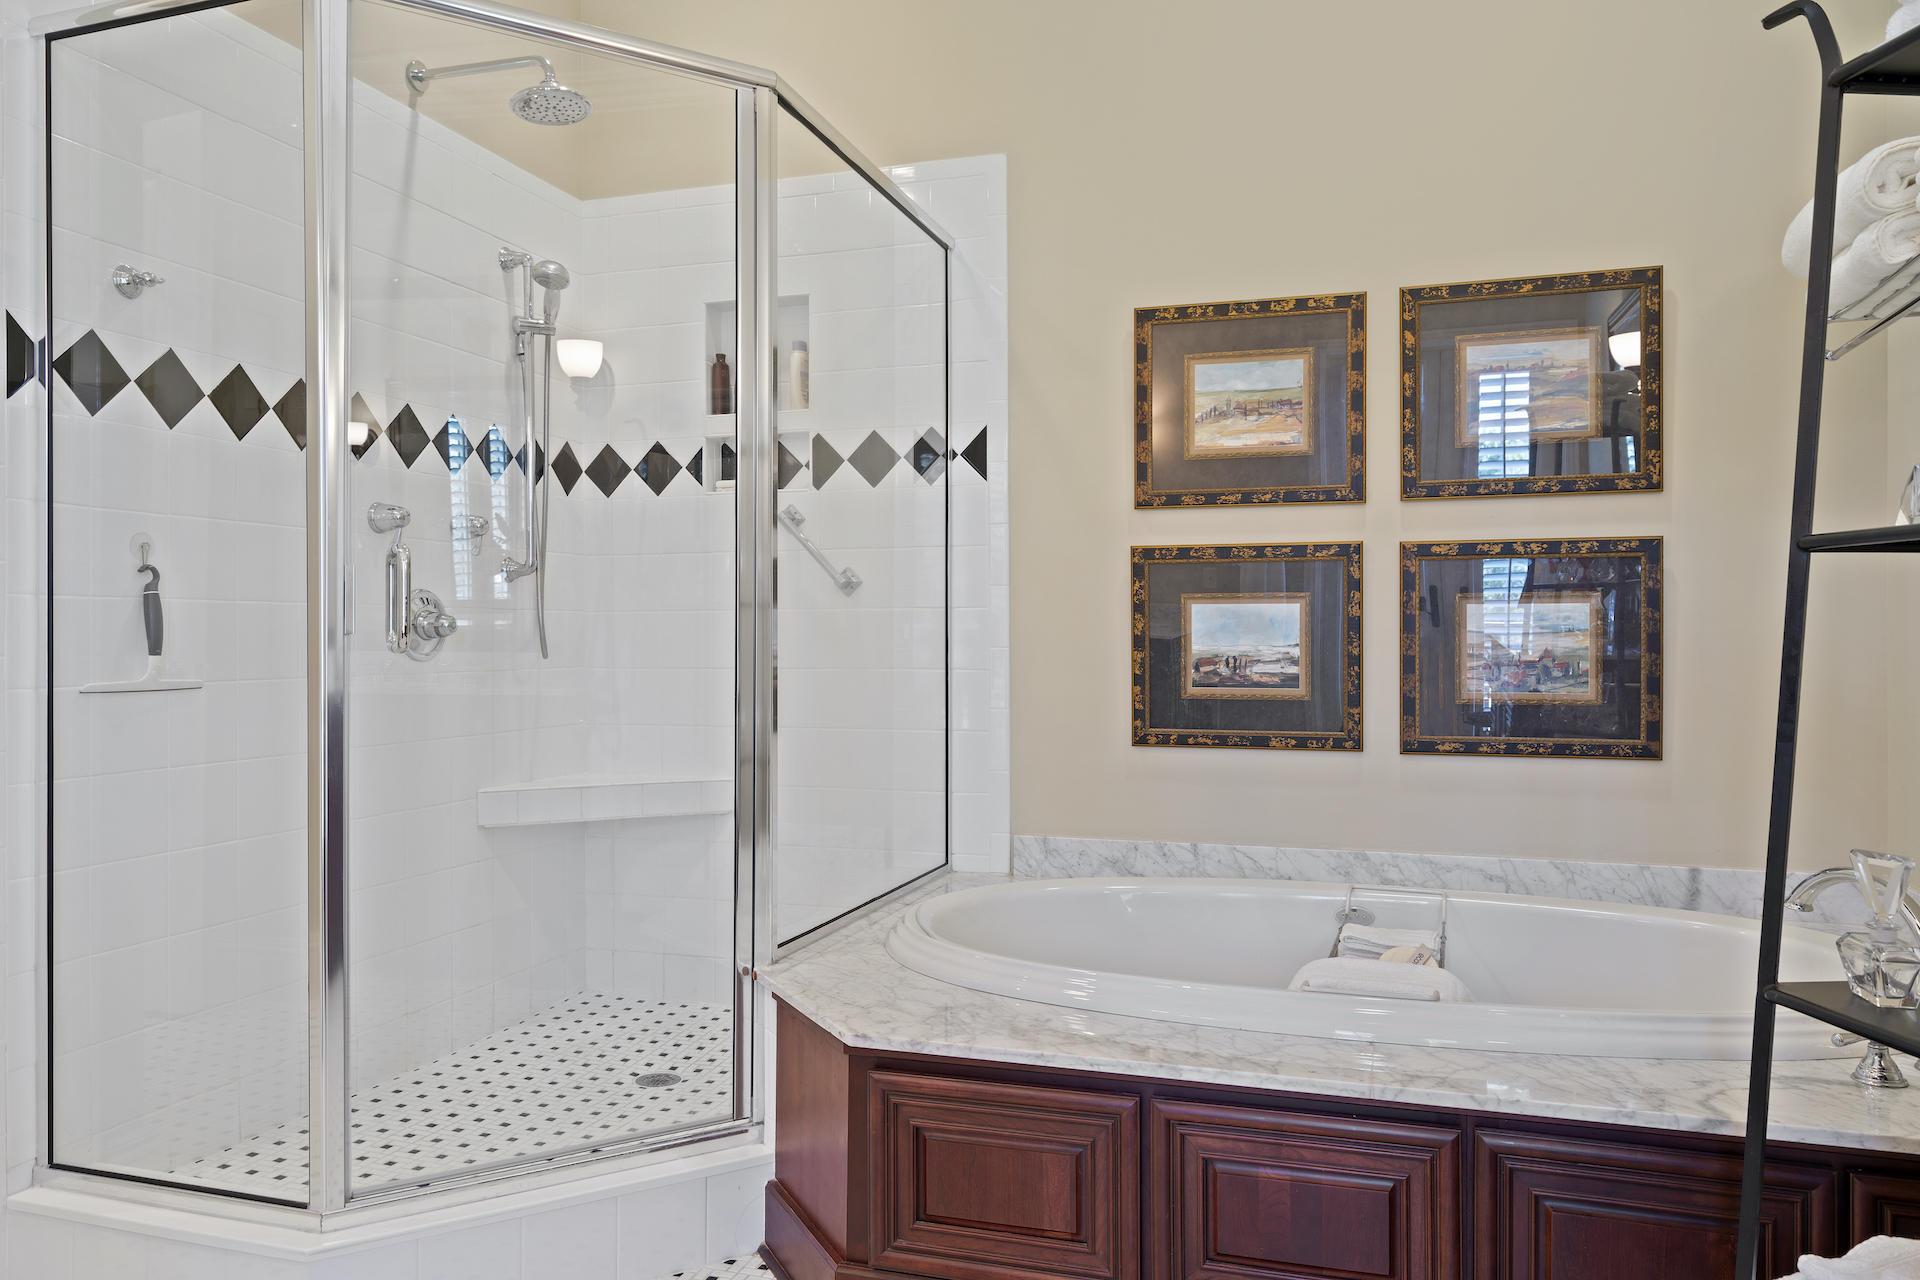 Daniel Island Homes For Sale - 250 Island Park, Charleston, SC - 4